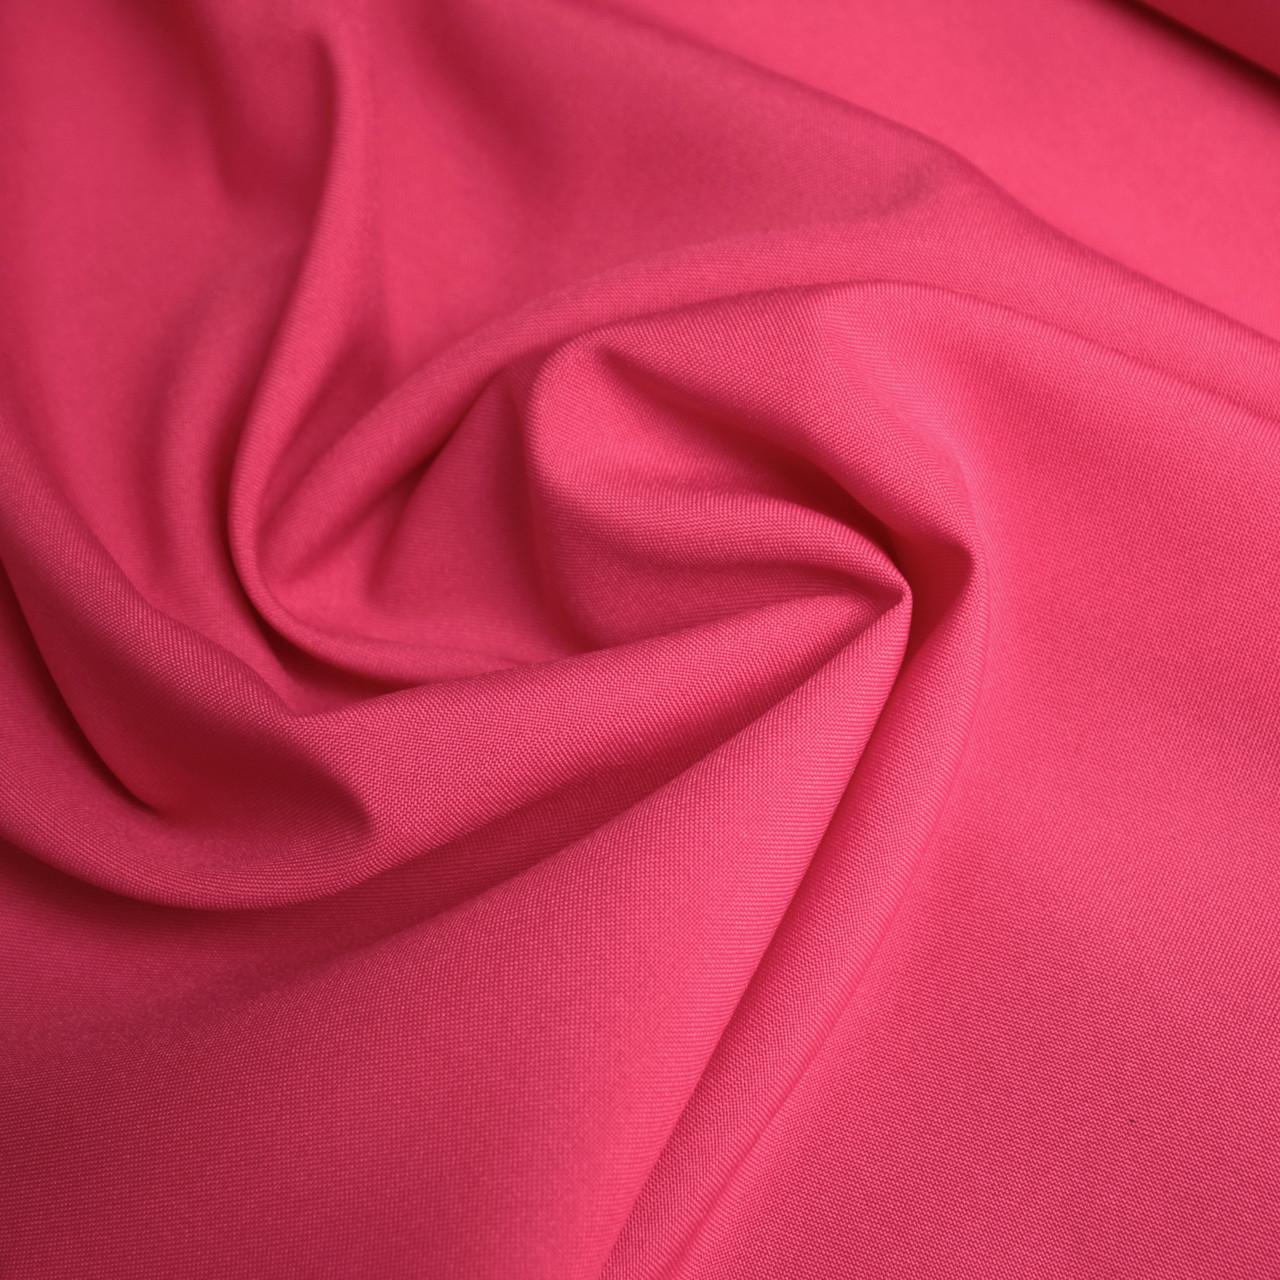 Ткань габардин малиновый